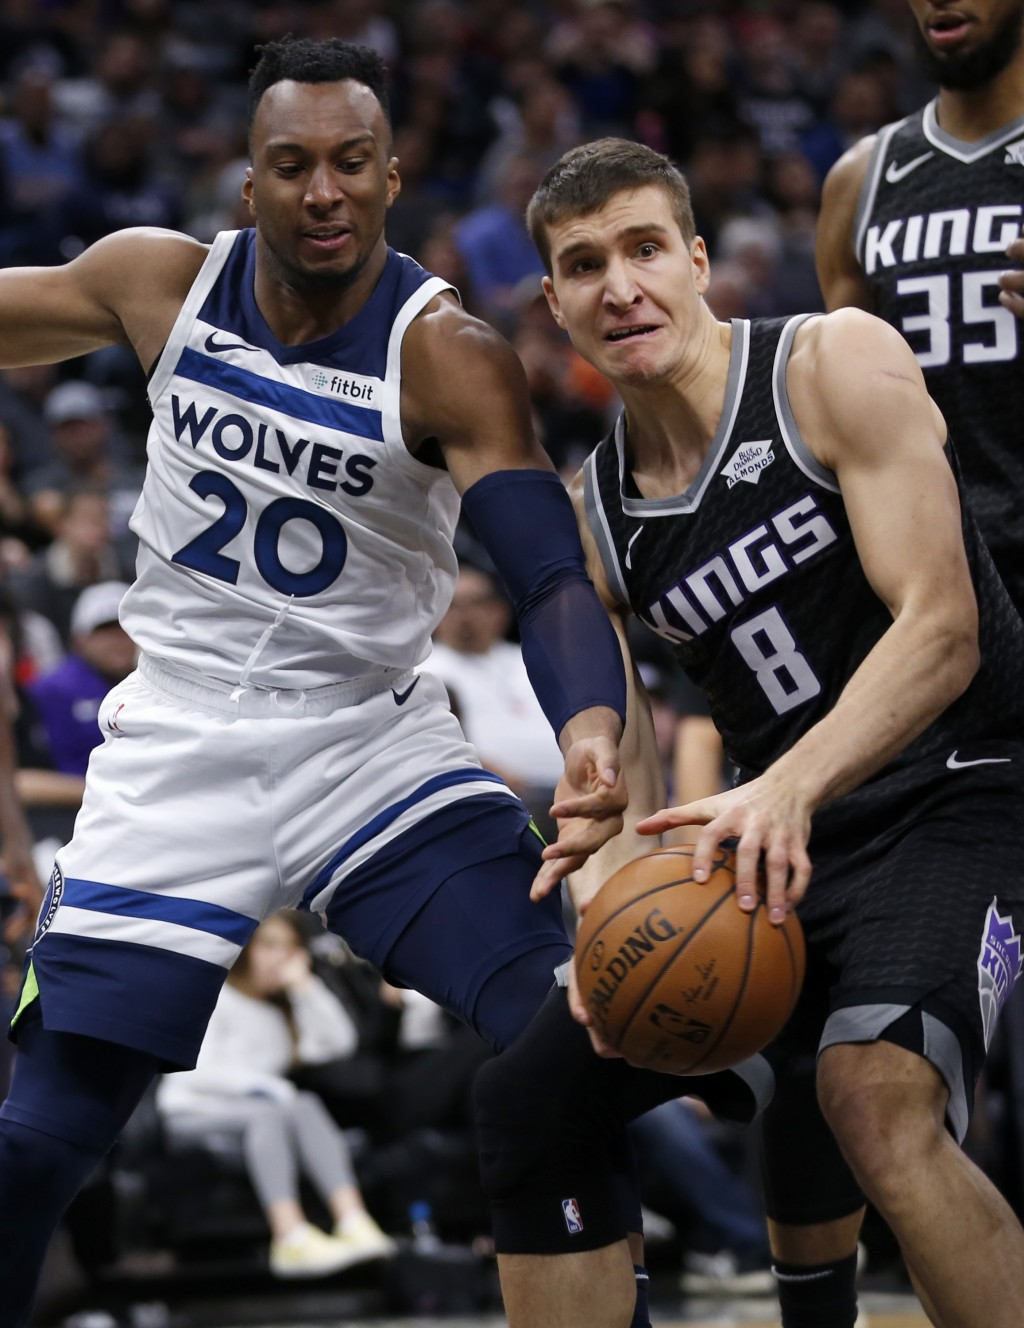 Sacramento Kings guard Bogdan Bogdanovic, right, grabs a rebound against Minnesota Timberwolves guard Josh Okogie during the first quarter of an NBA b...